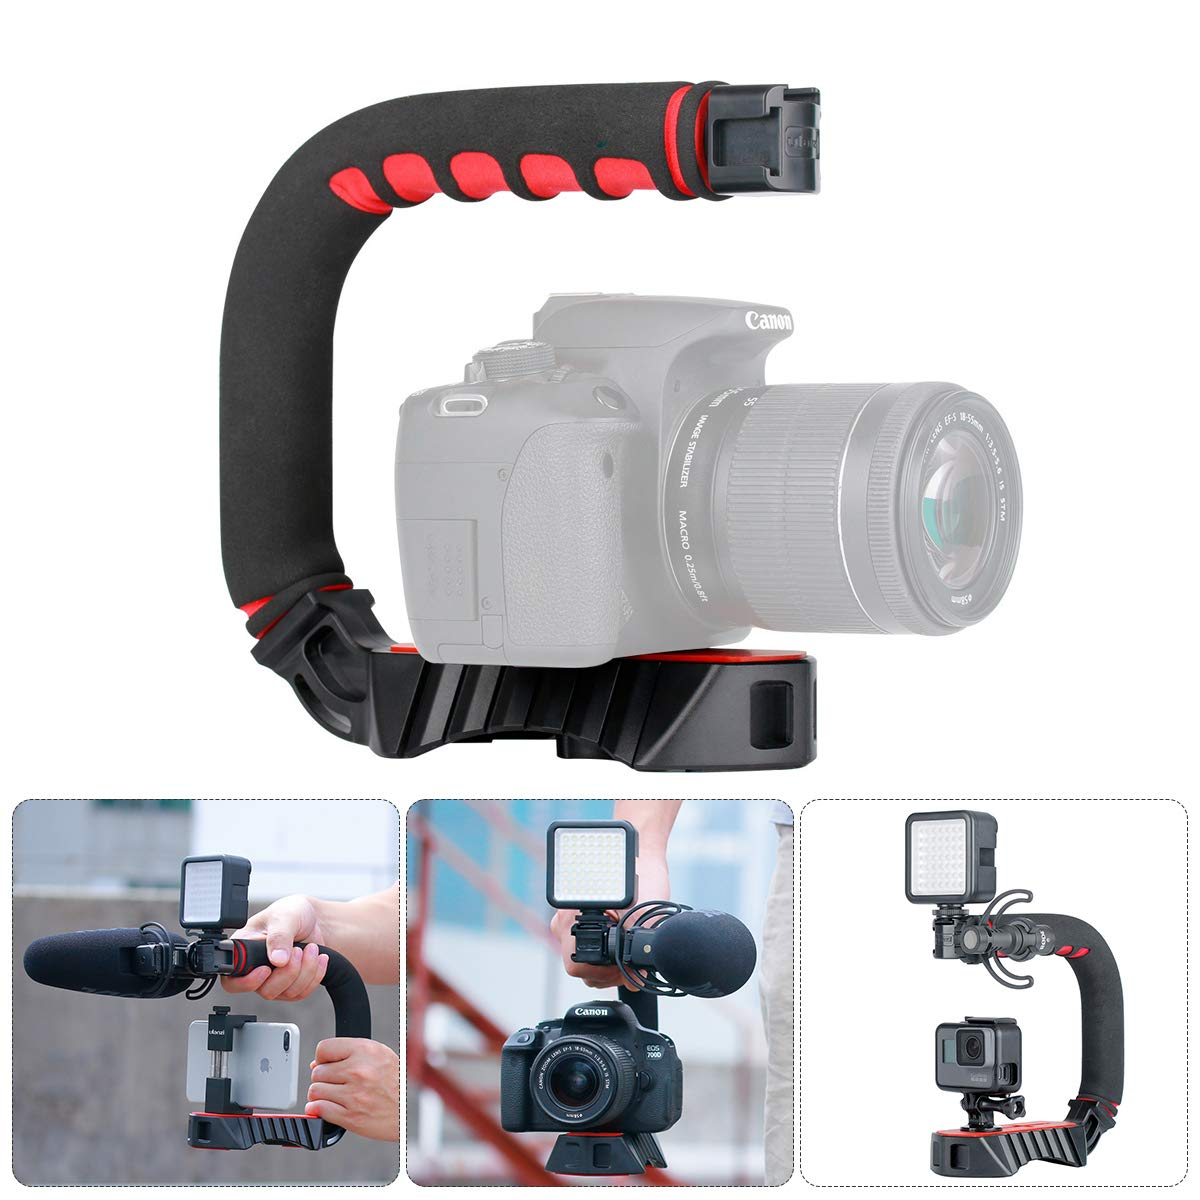 Pro Video Stabilizing Handle Grip for Kyocera Finecam S5R Vertical Shoe Mount Stabilizer Handle